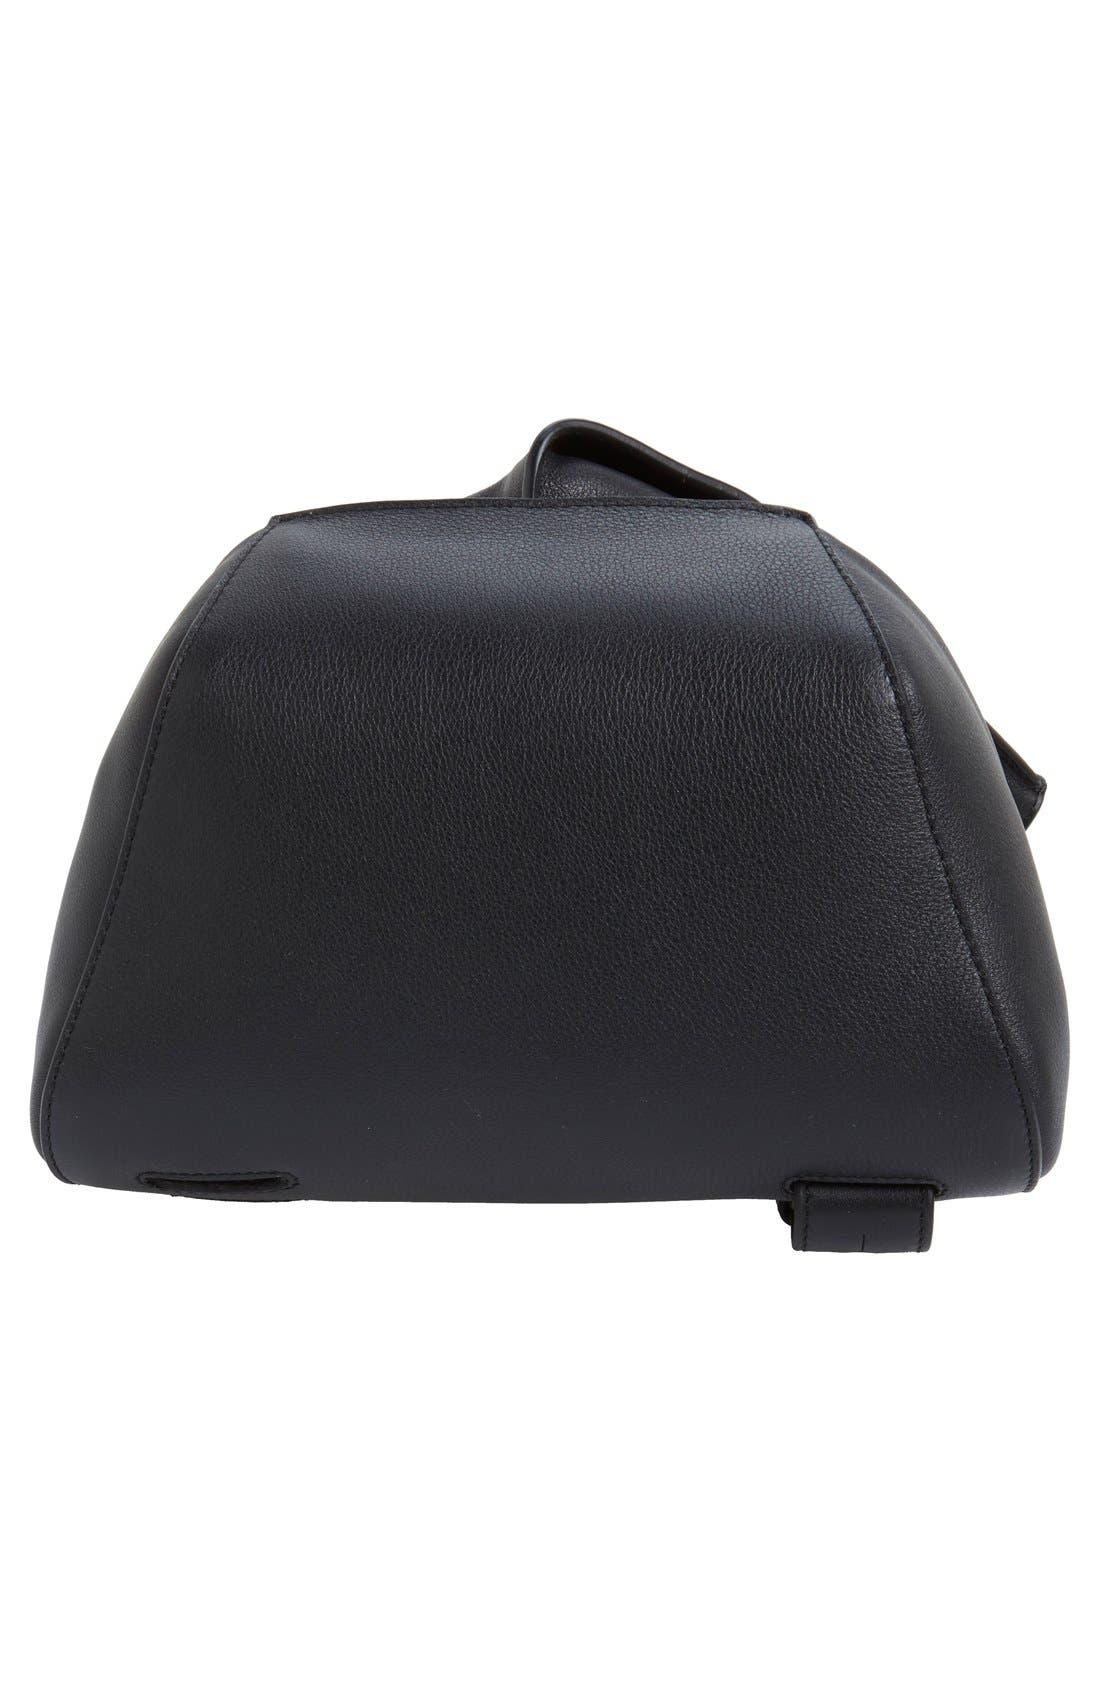 'Small Anton' Calfskin Leather Sling Bag,                             Alternate thumbnail 3, color,                             001